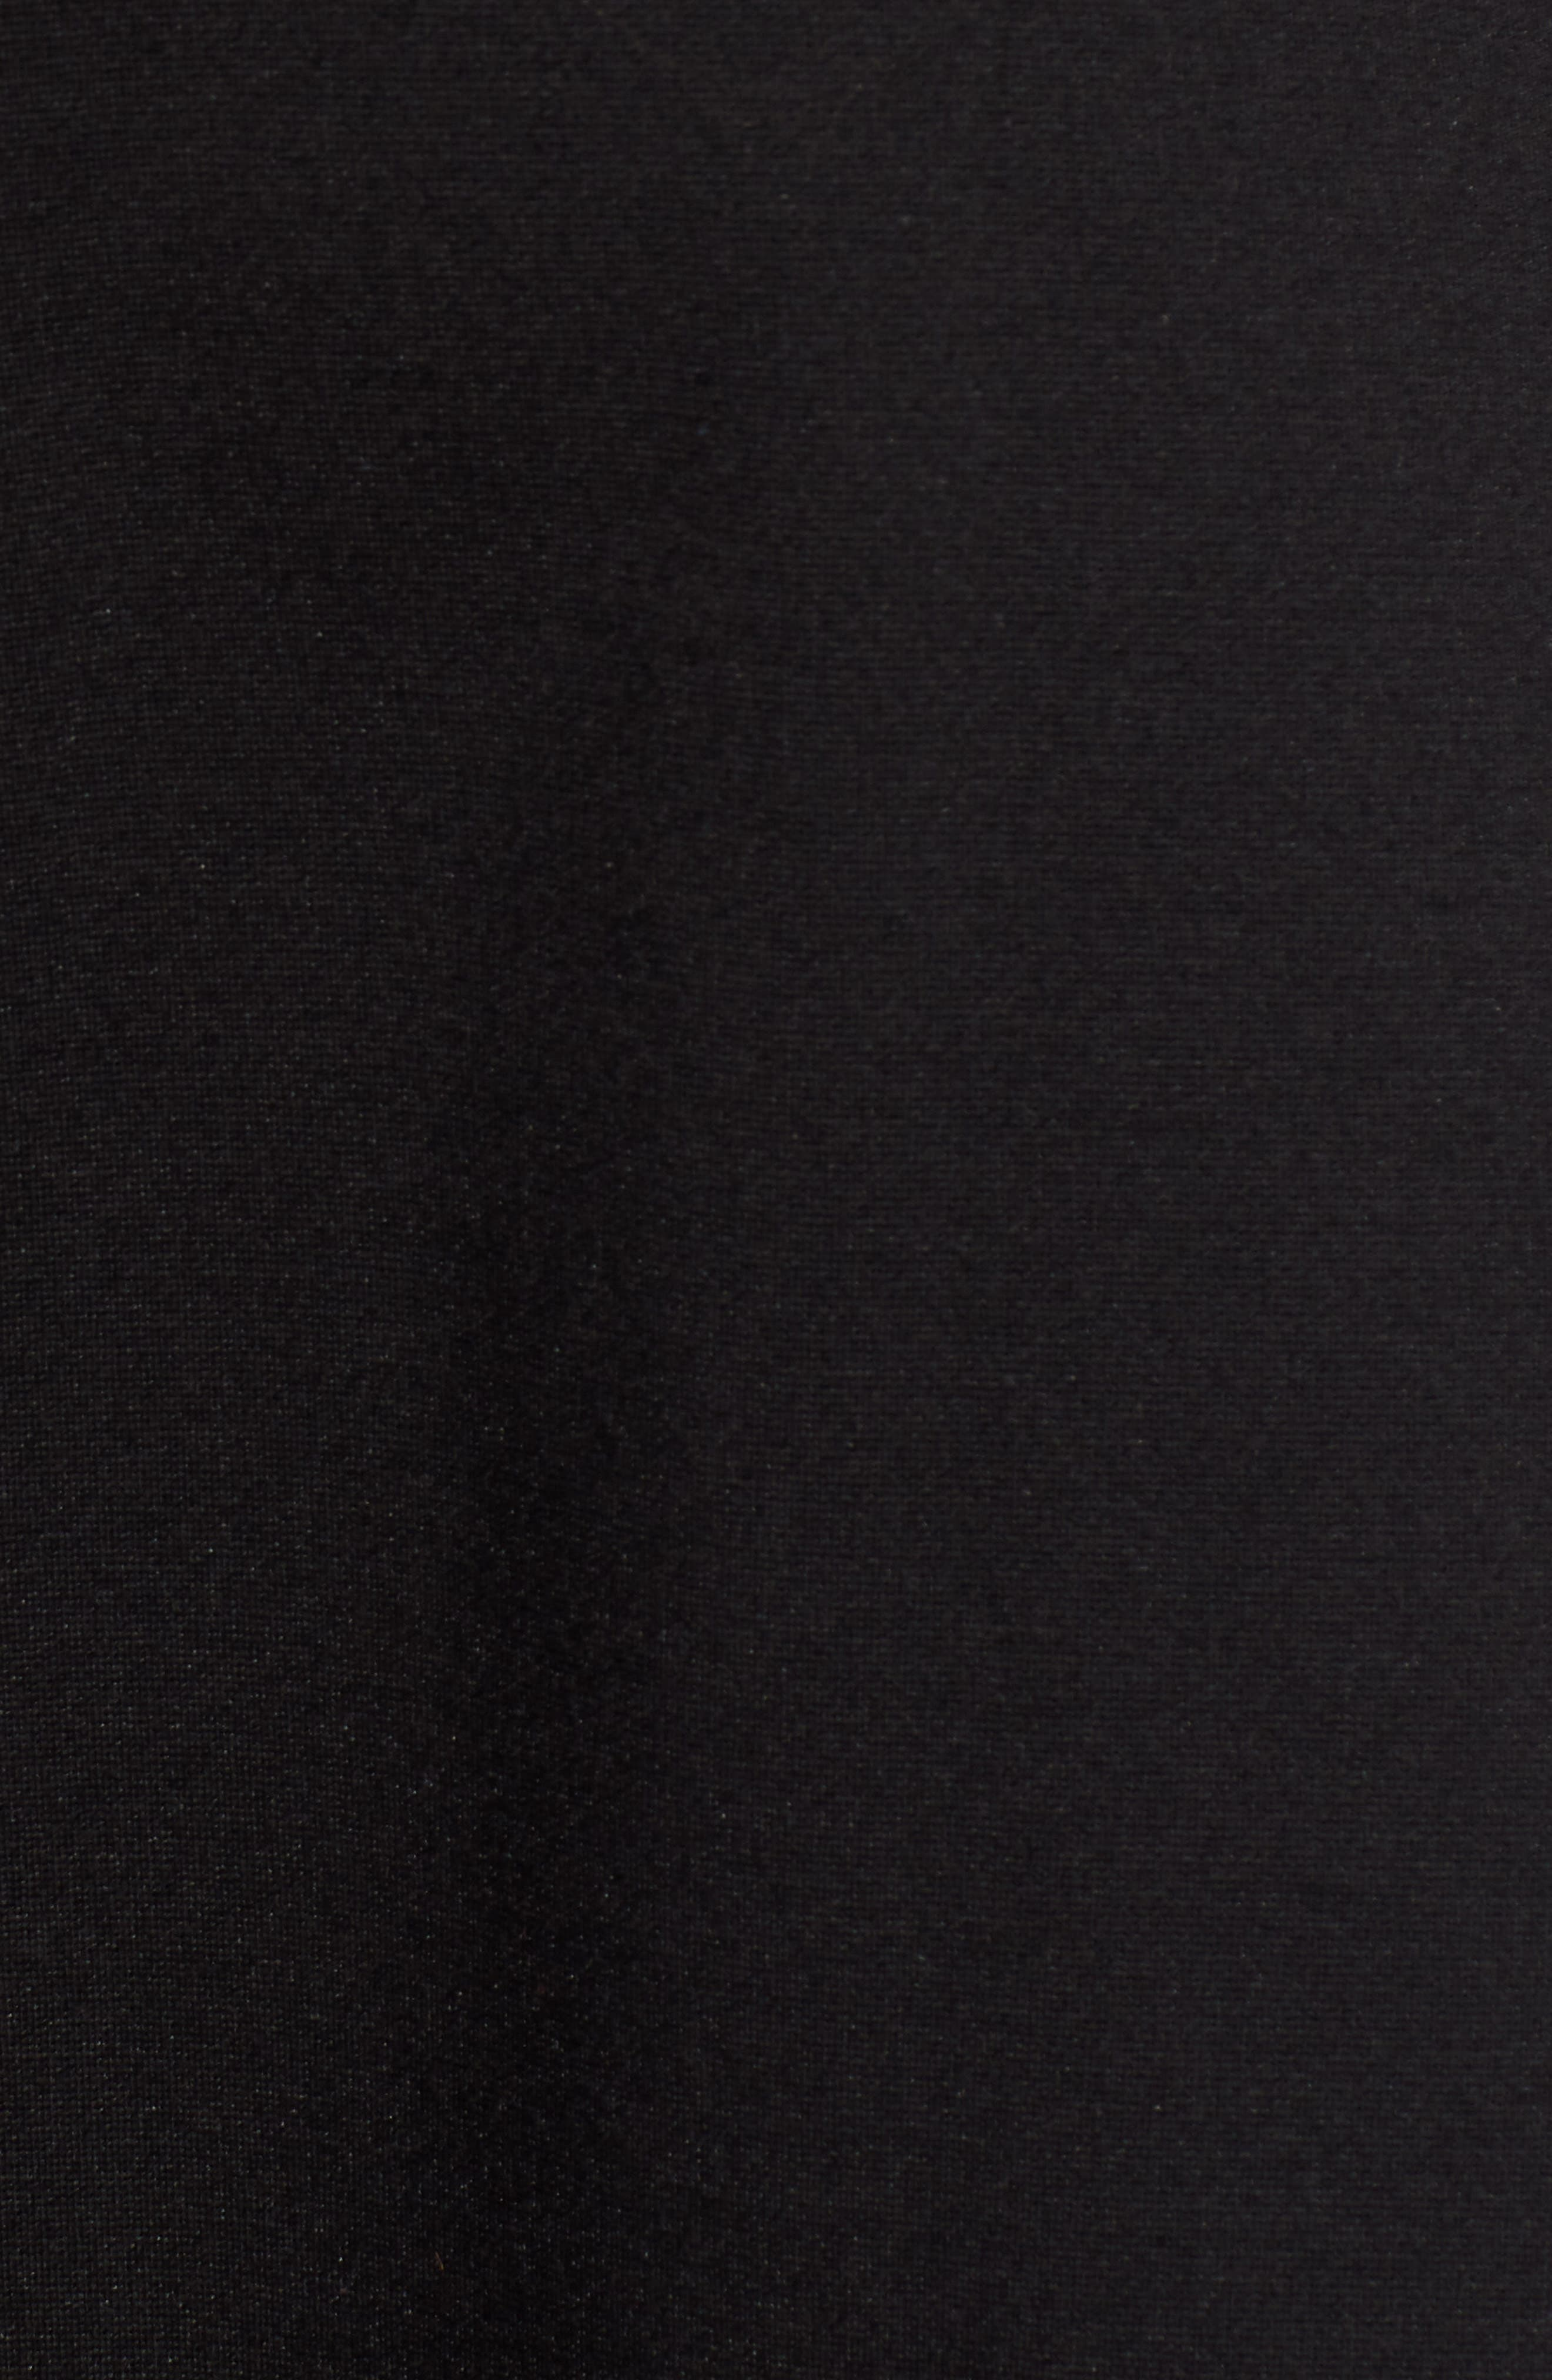 x Atlantic-Pacific Stretch Ponte Dress,                             Alternate thumbnail 6, color,                             001